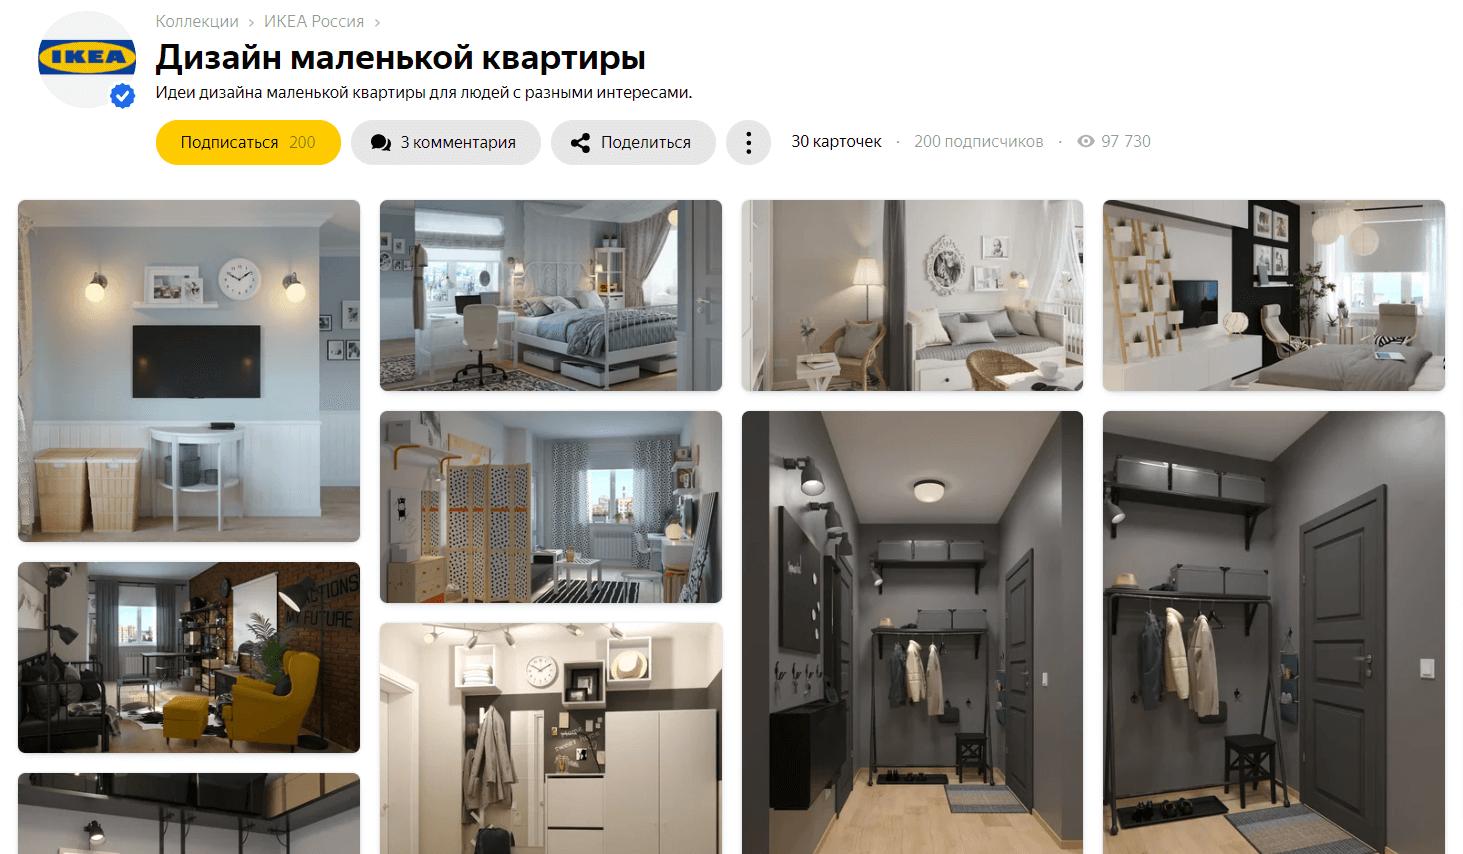 Дизайн маленькой квартиры от IKEA